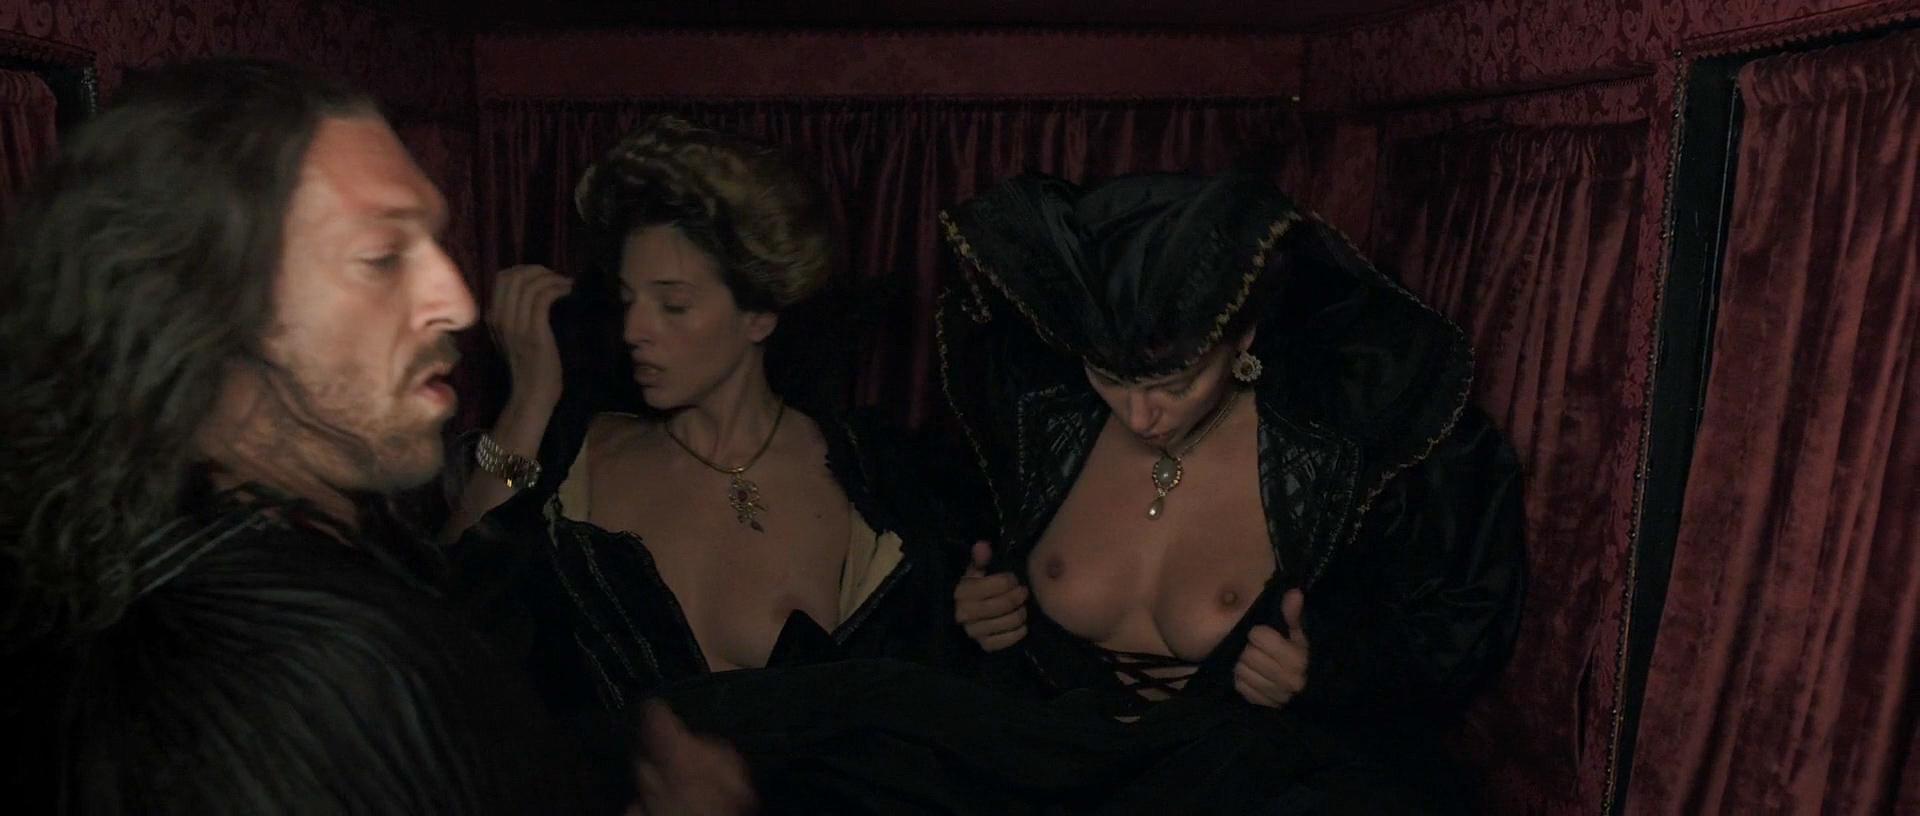 Stacy Martin nude butt others nude - Il racconto dei racconti (2015) hd1080p (9)